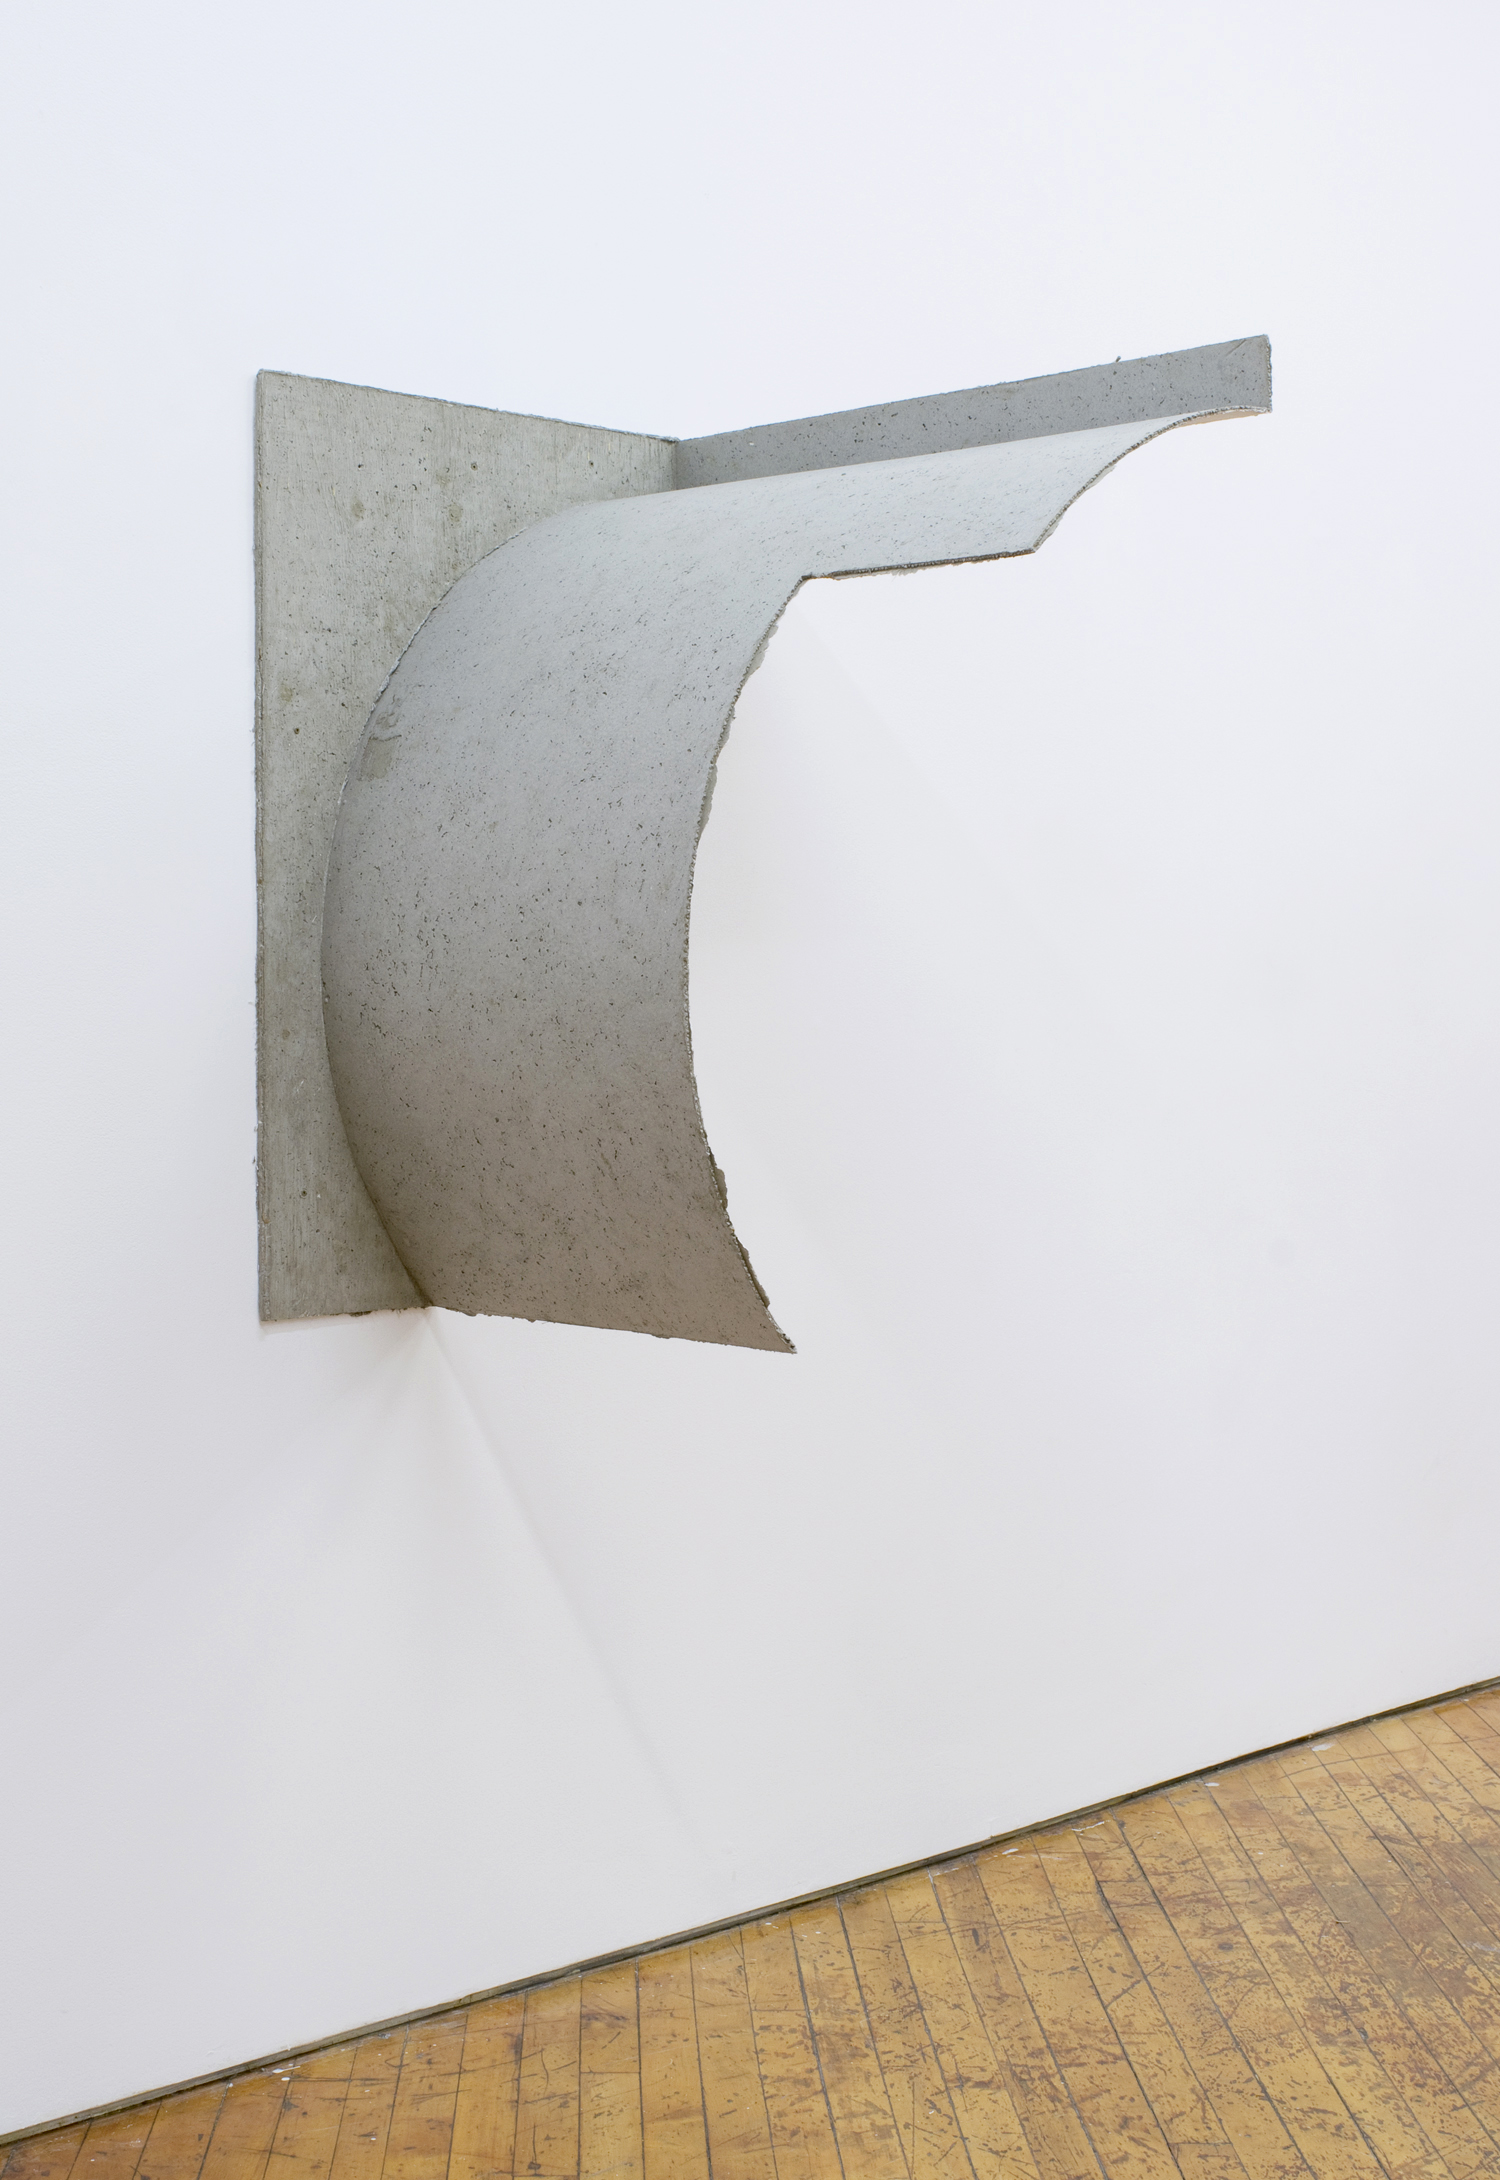 Phano , 2017, 39 x 25 x 33 inches, papier mache, concrete, plywood, gesso